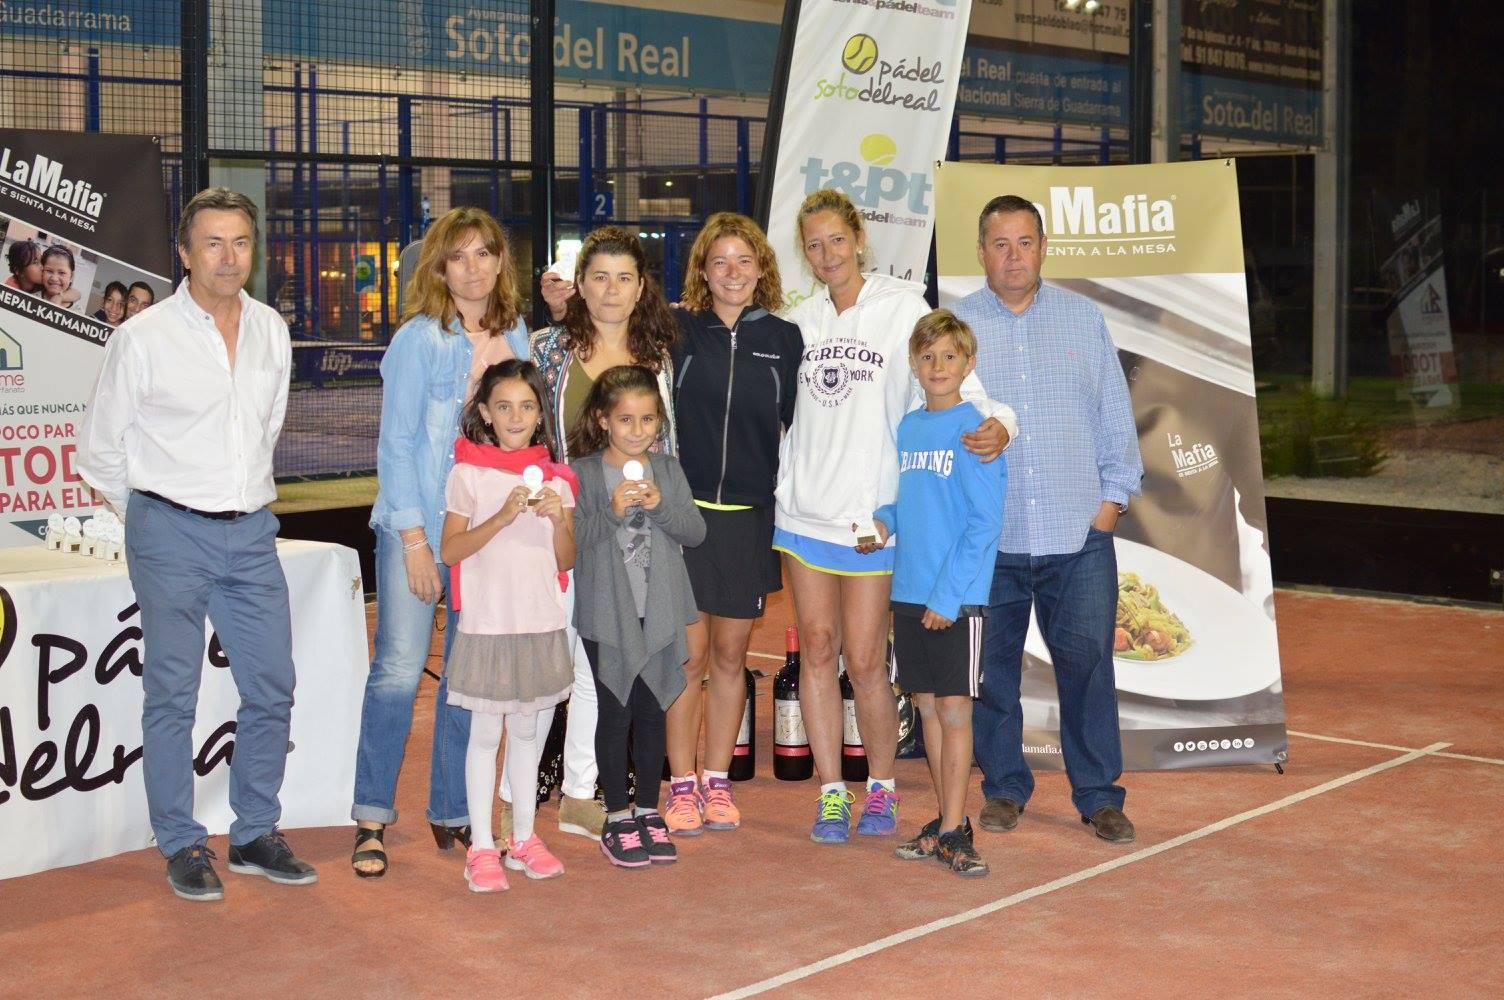 14468522 320541834973451 7155065649869128454 o - La Mafia con el Deporte. Torneo de La Mafia Colmenar Viejo.